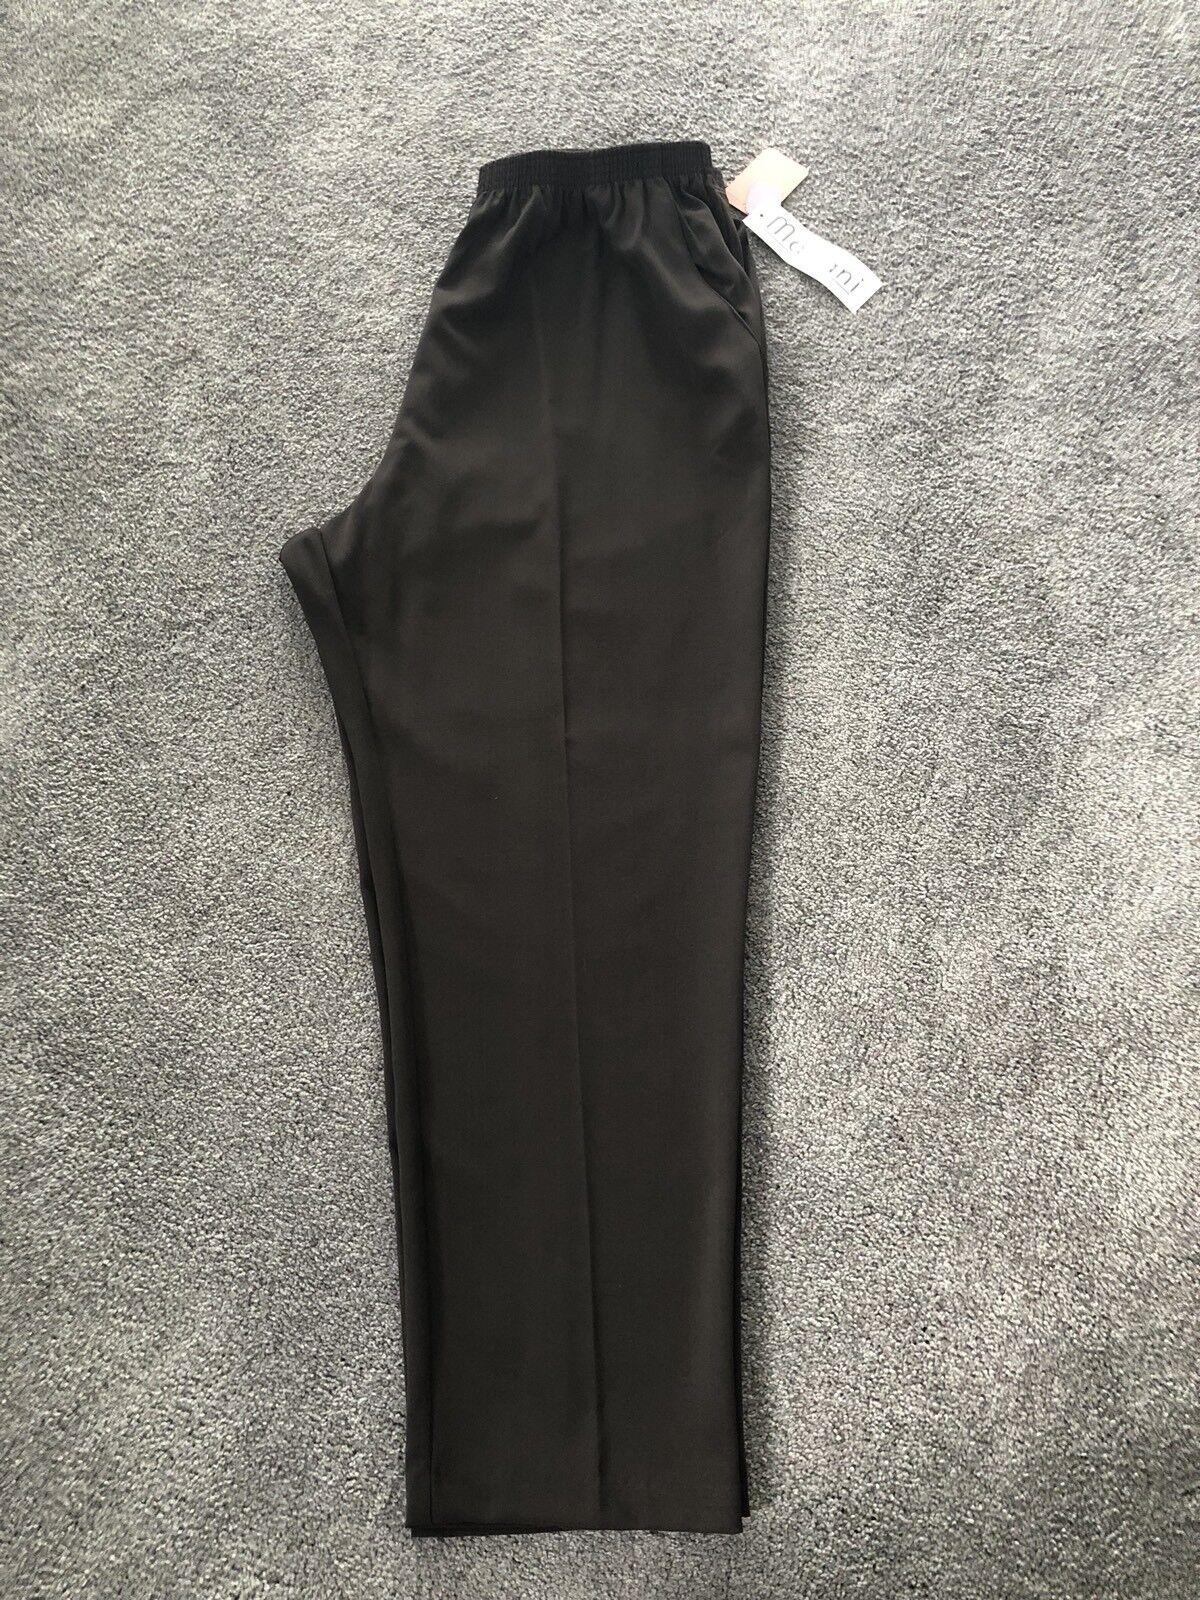 NEW Mariani Brown Pants With Elastic Waist. Sz 30. MAR 380